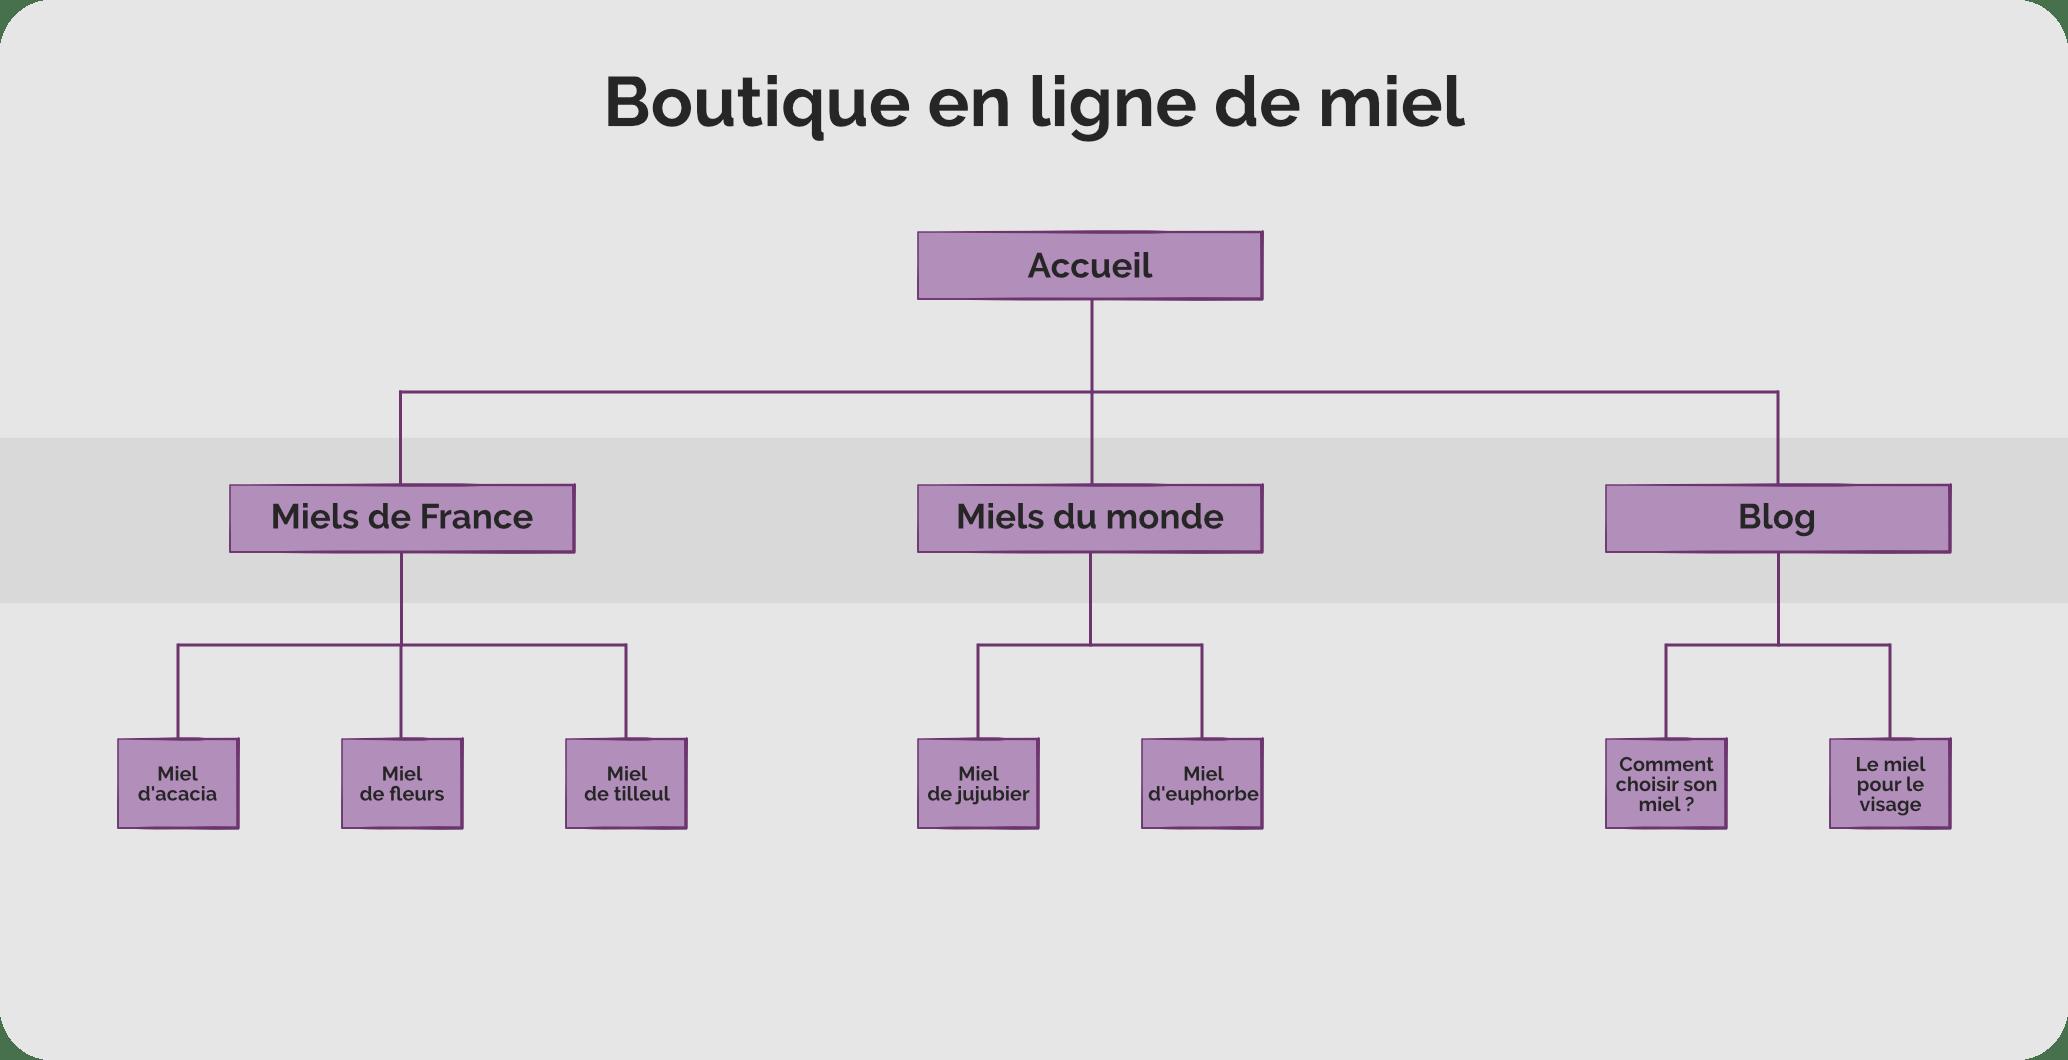 Arborescence-boutique-miel